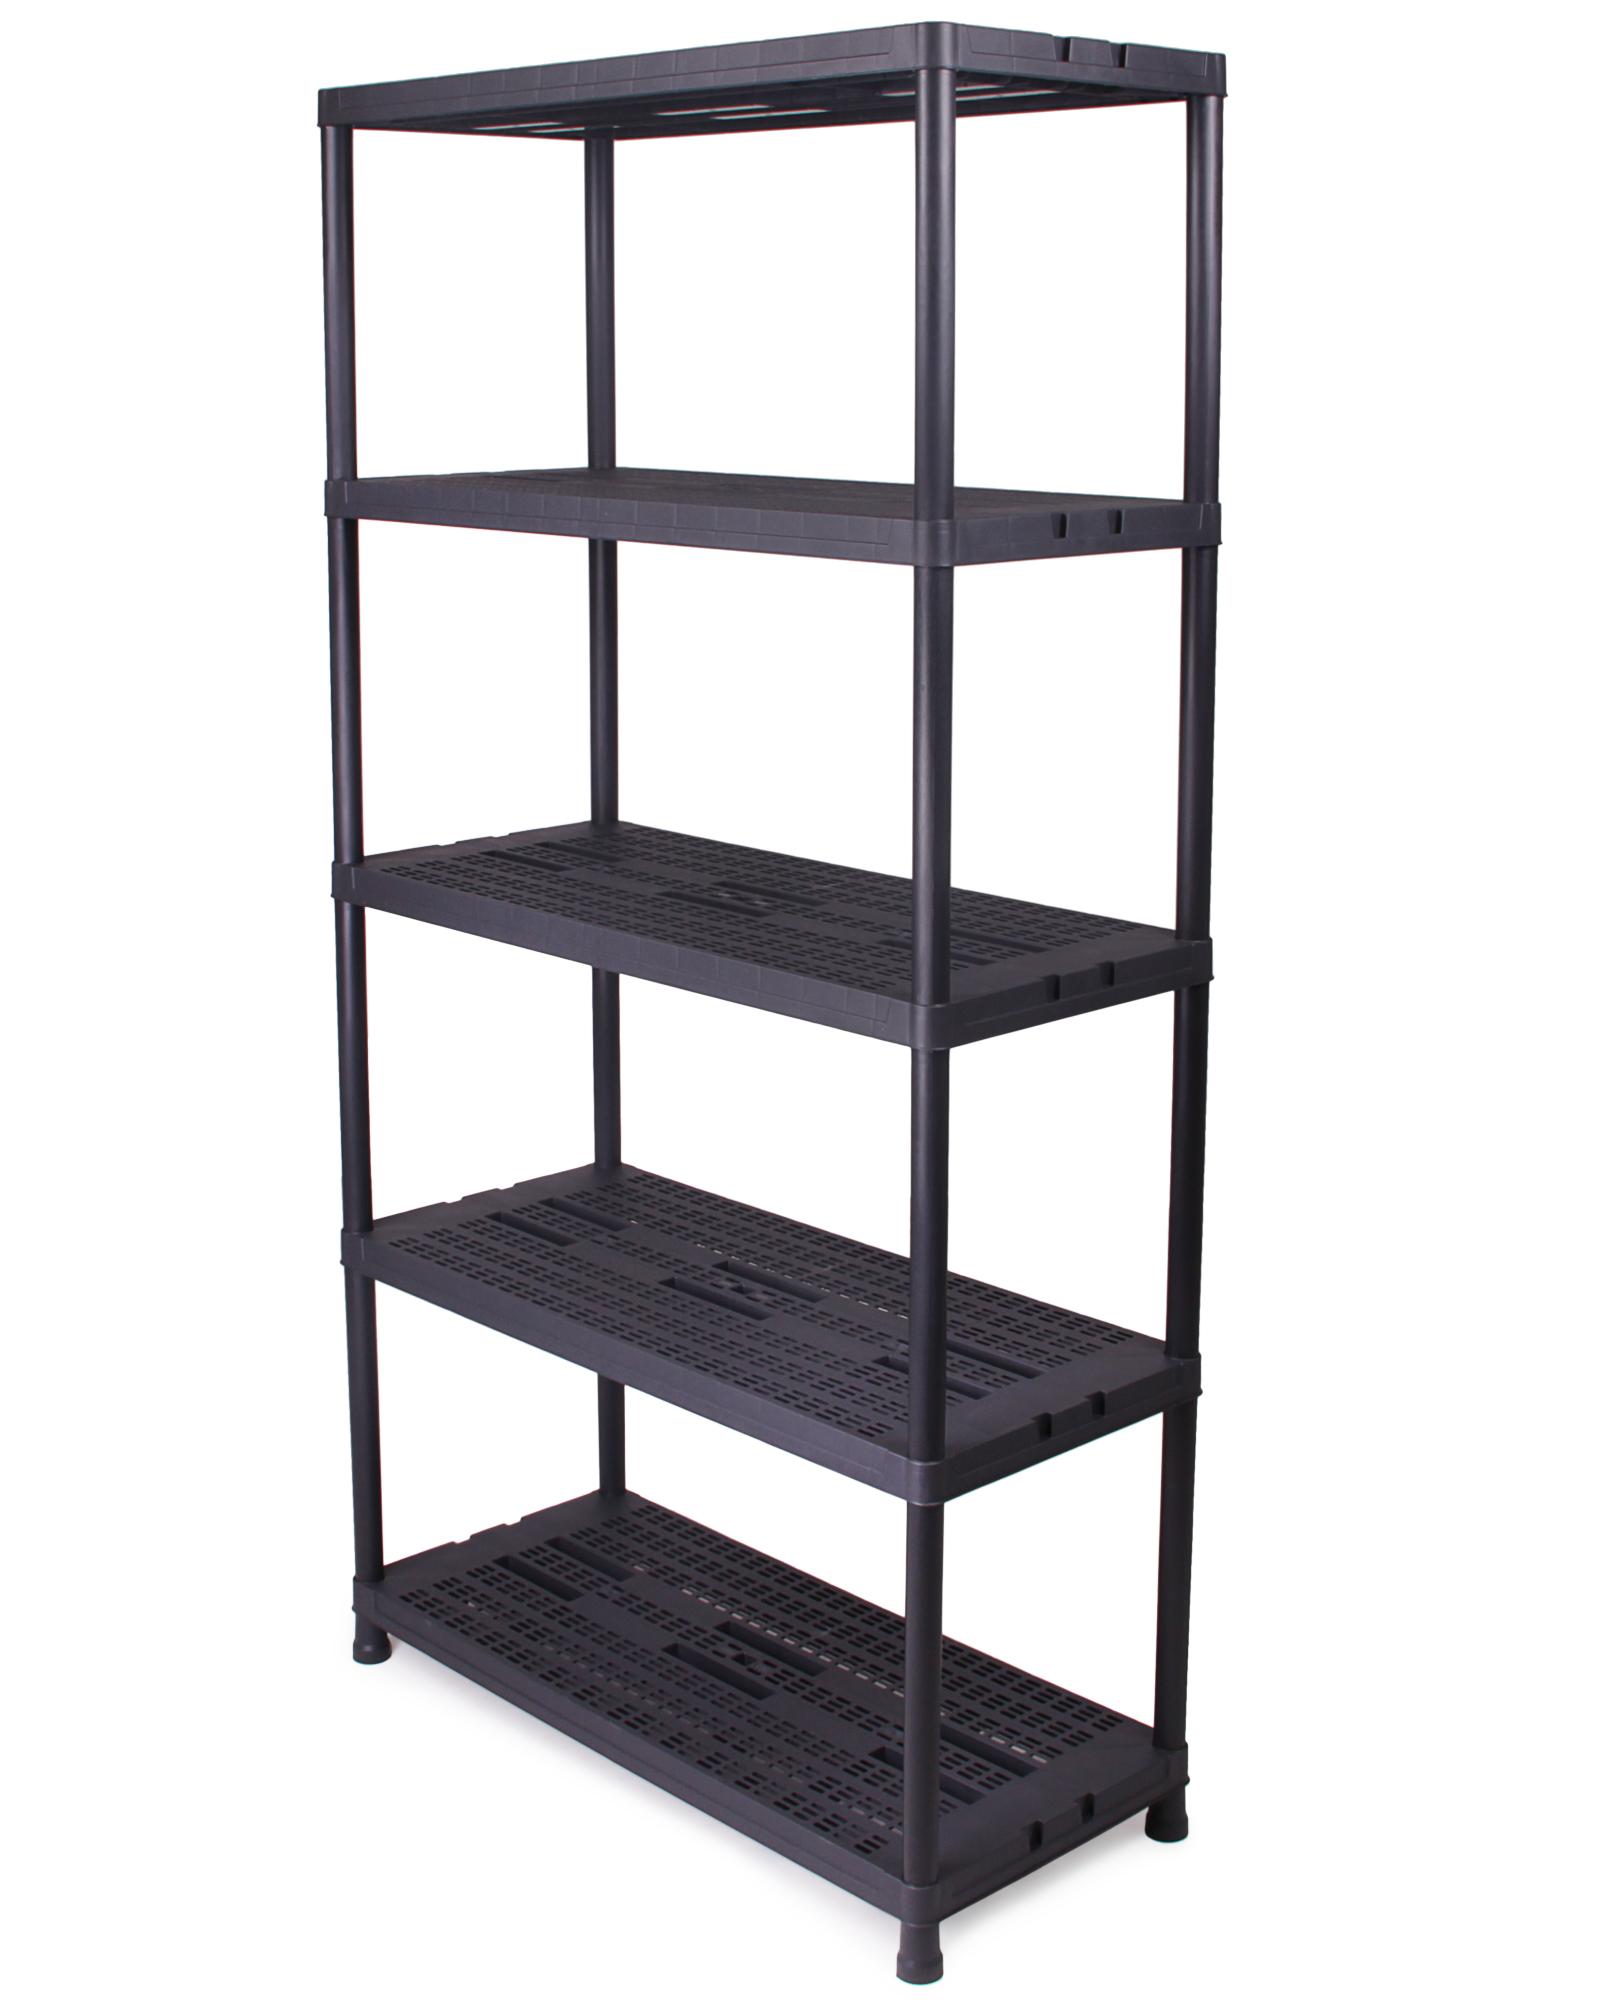 ondis24 kunststoffregal steckregal schwerlastregal schwarz 90 cm g nstig online kaufen. Black Bedroom Furniture Sets. Home Design Ideas